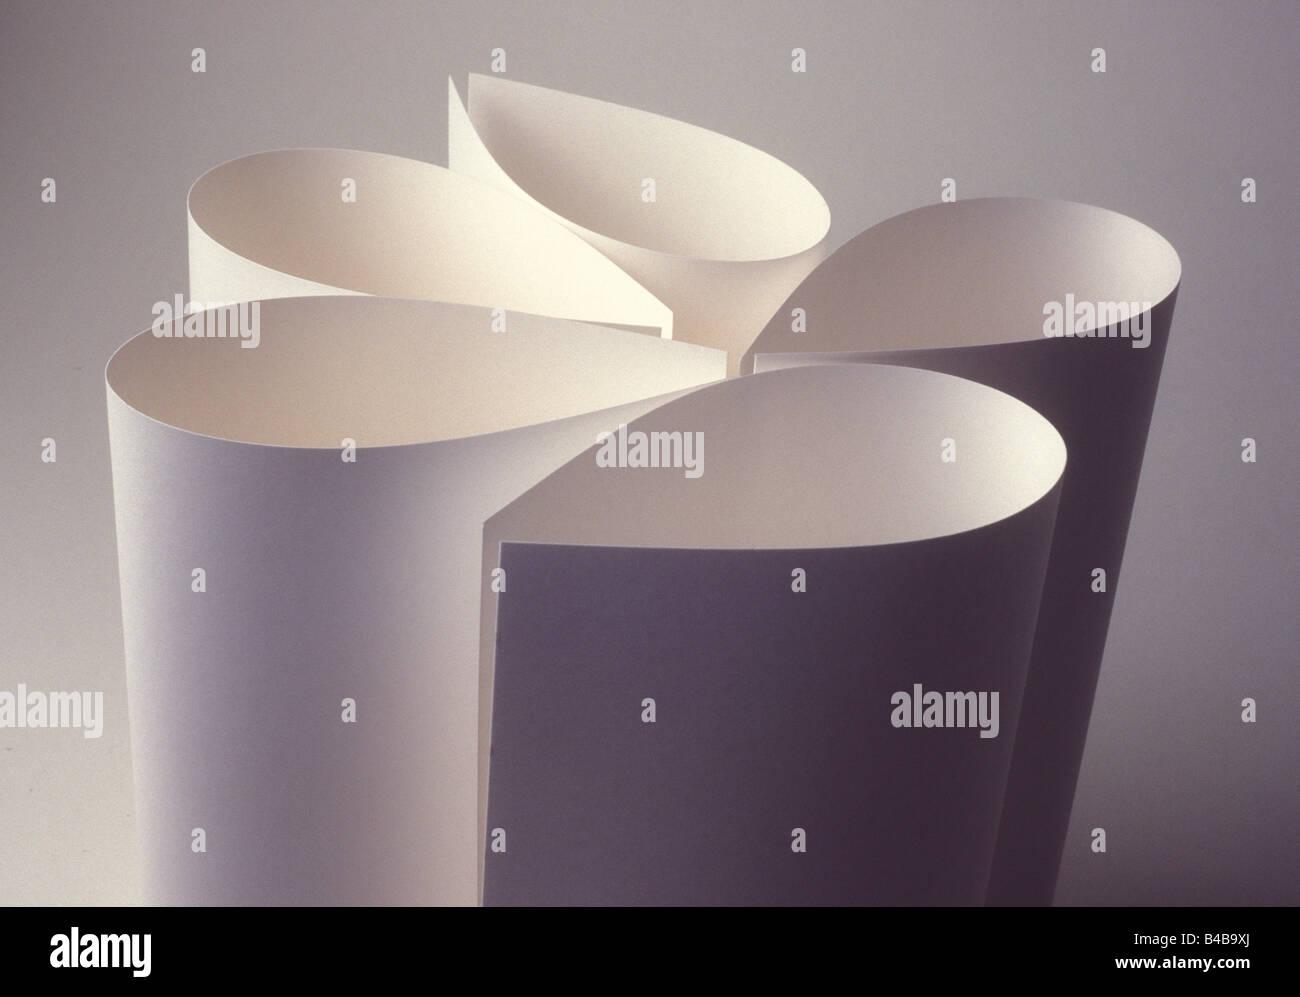 paper folds - Stock Image